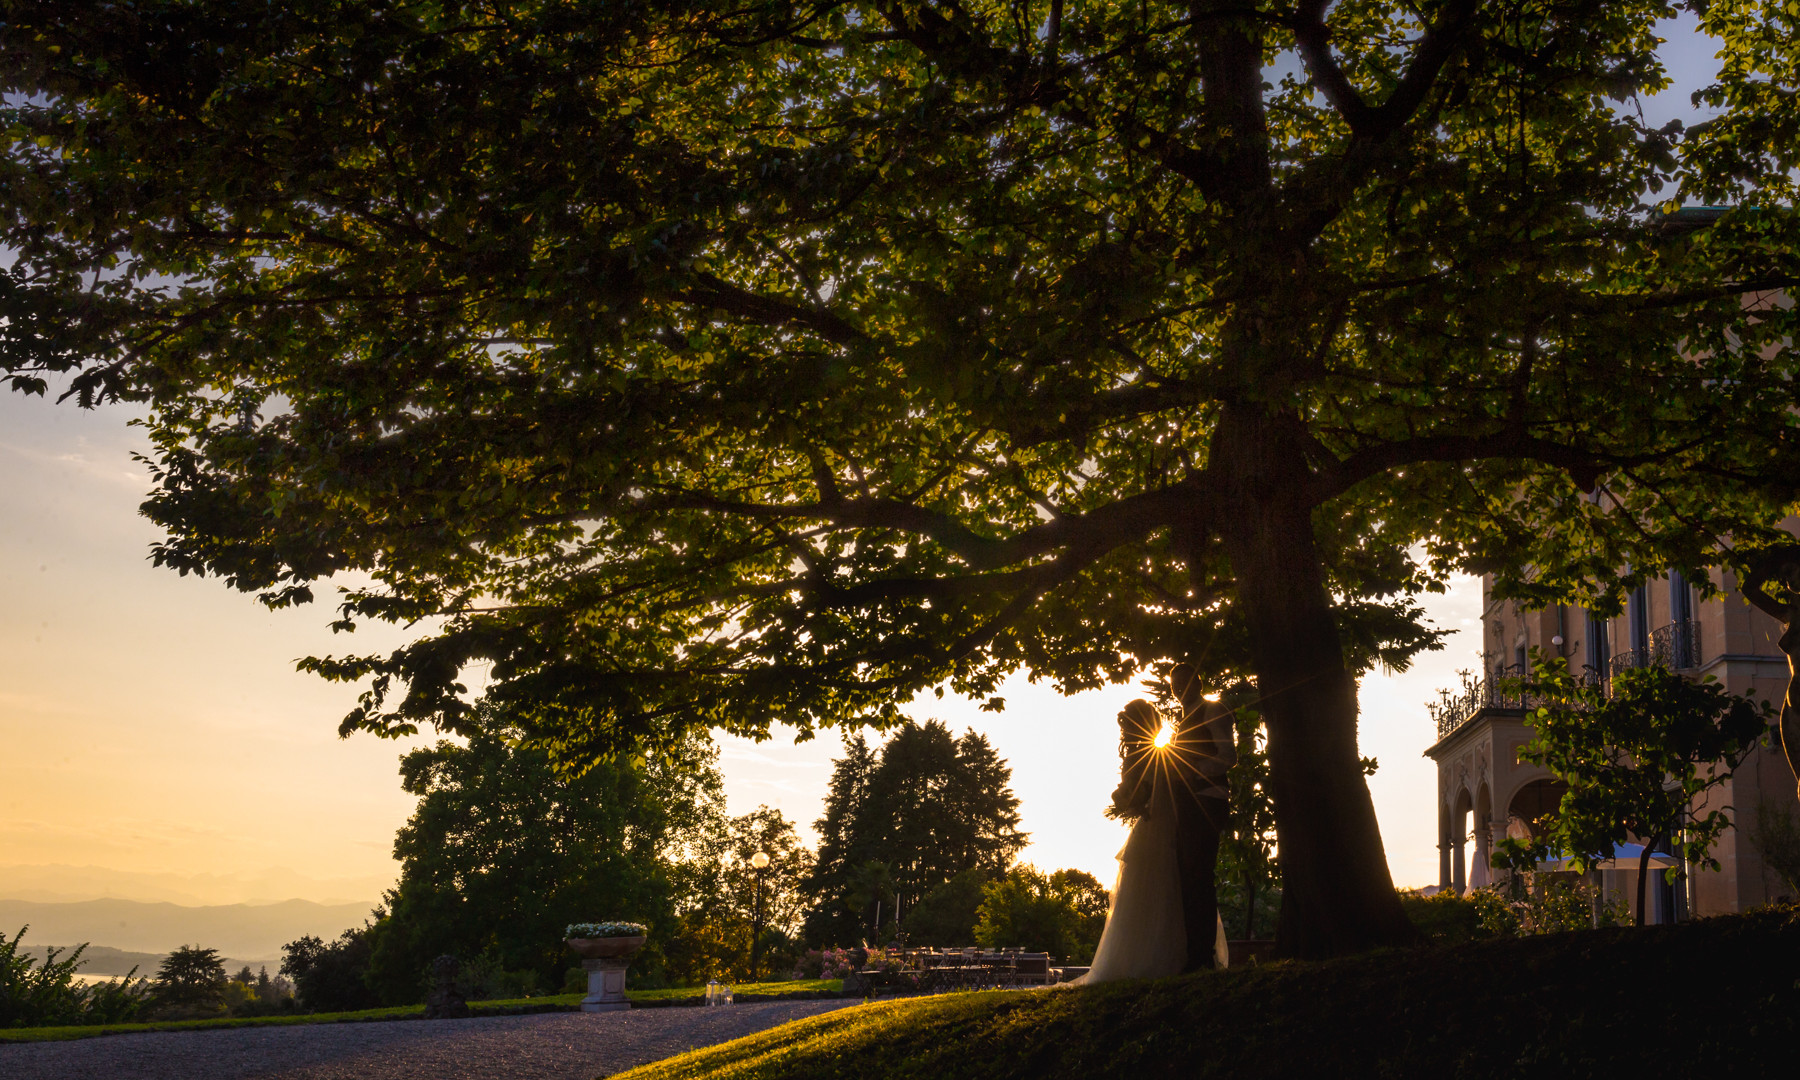 Foto di matrimonio al tramonto villa montalbano varese